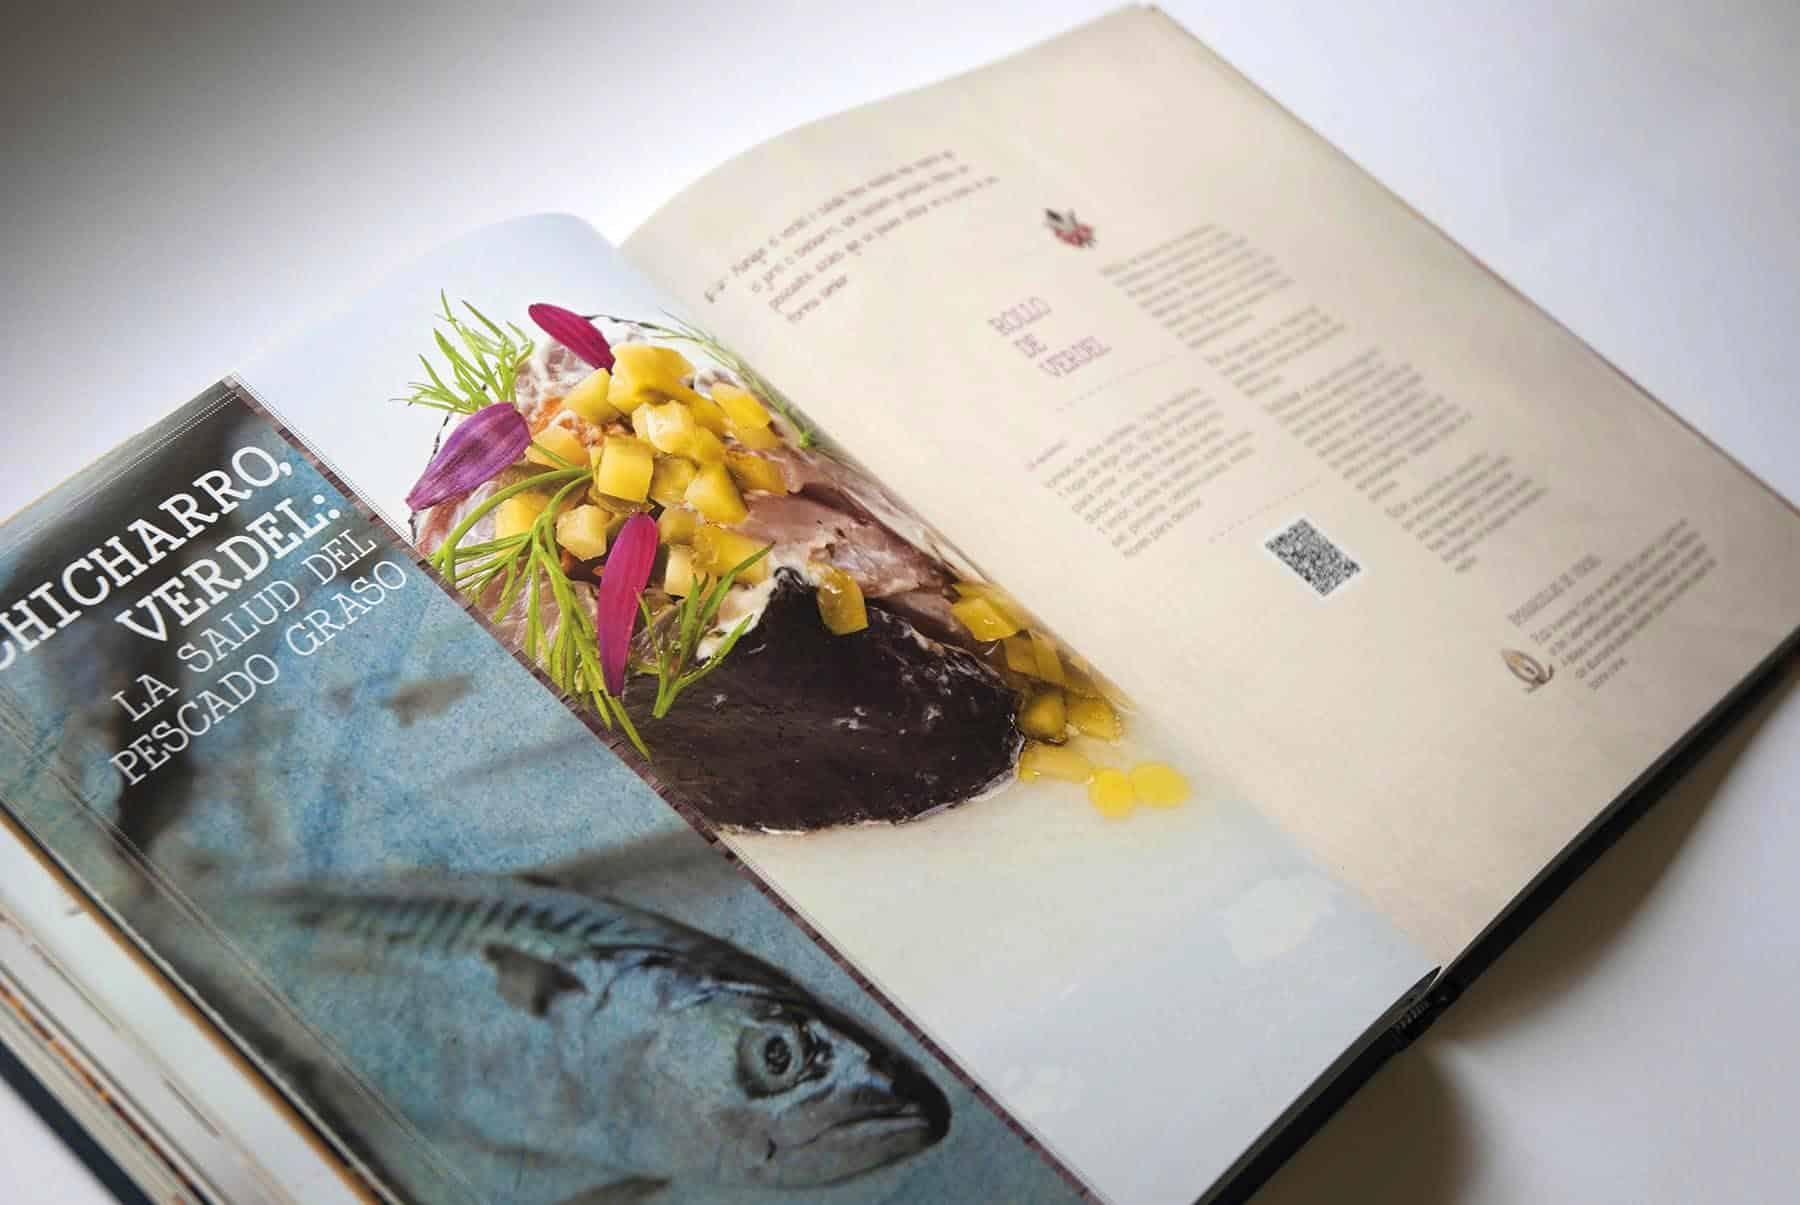 Diseño Editorial, Bruno Oteiza, interior